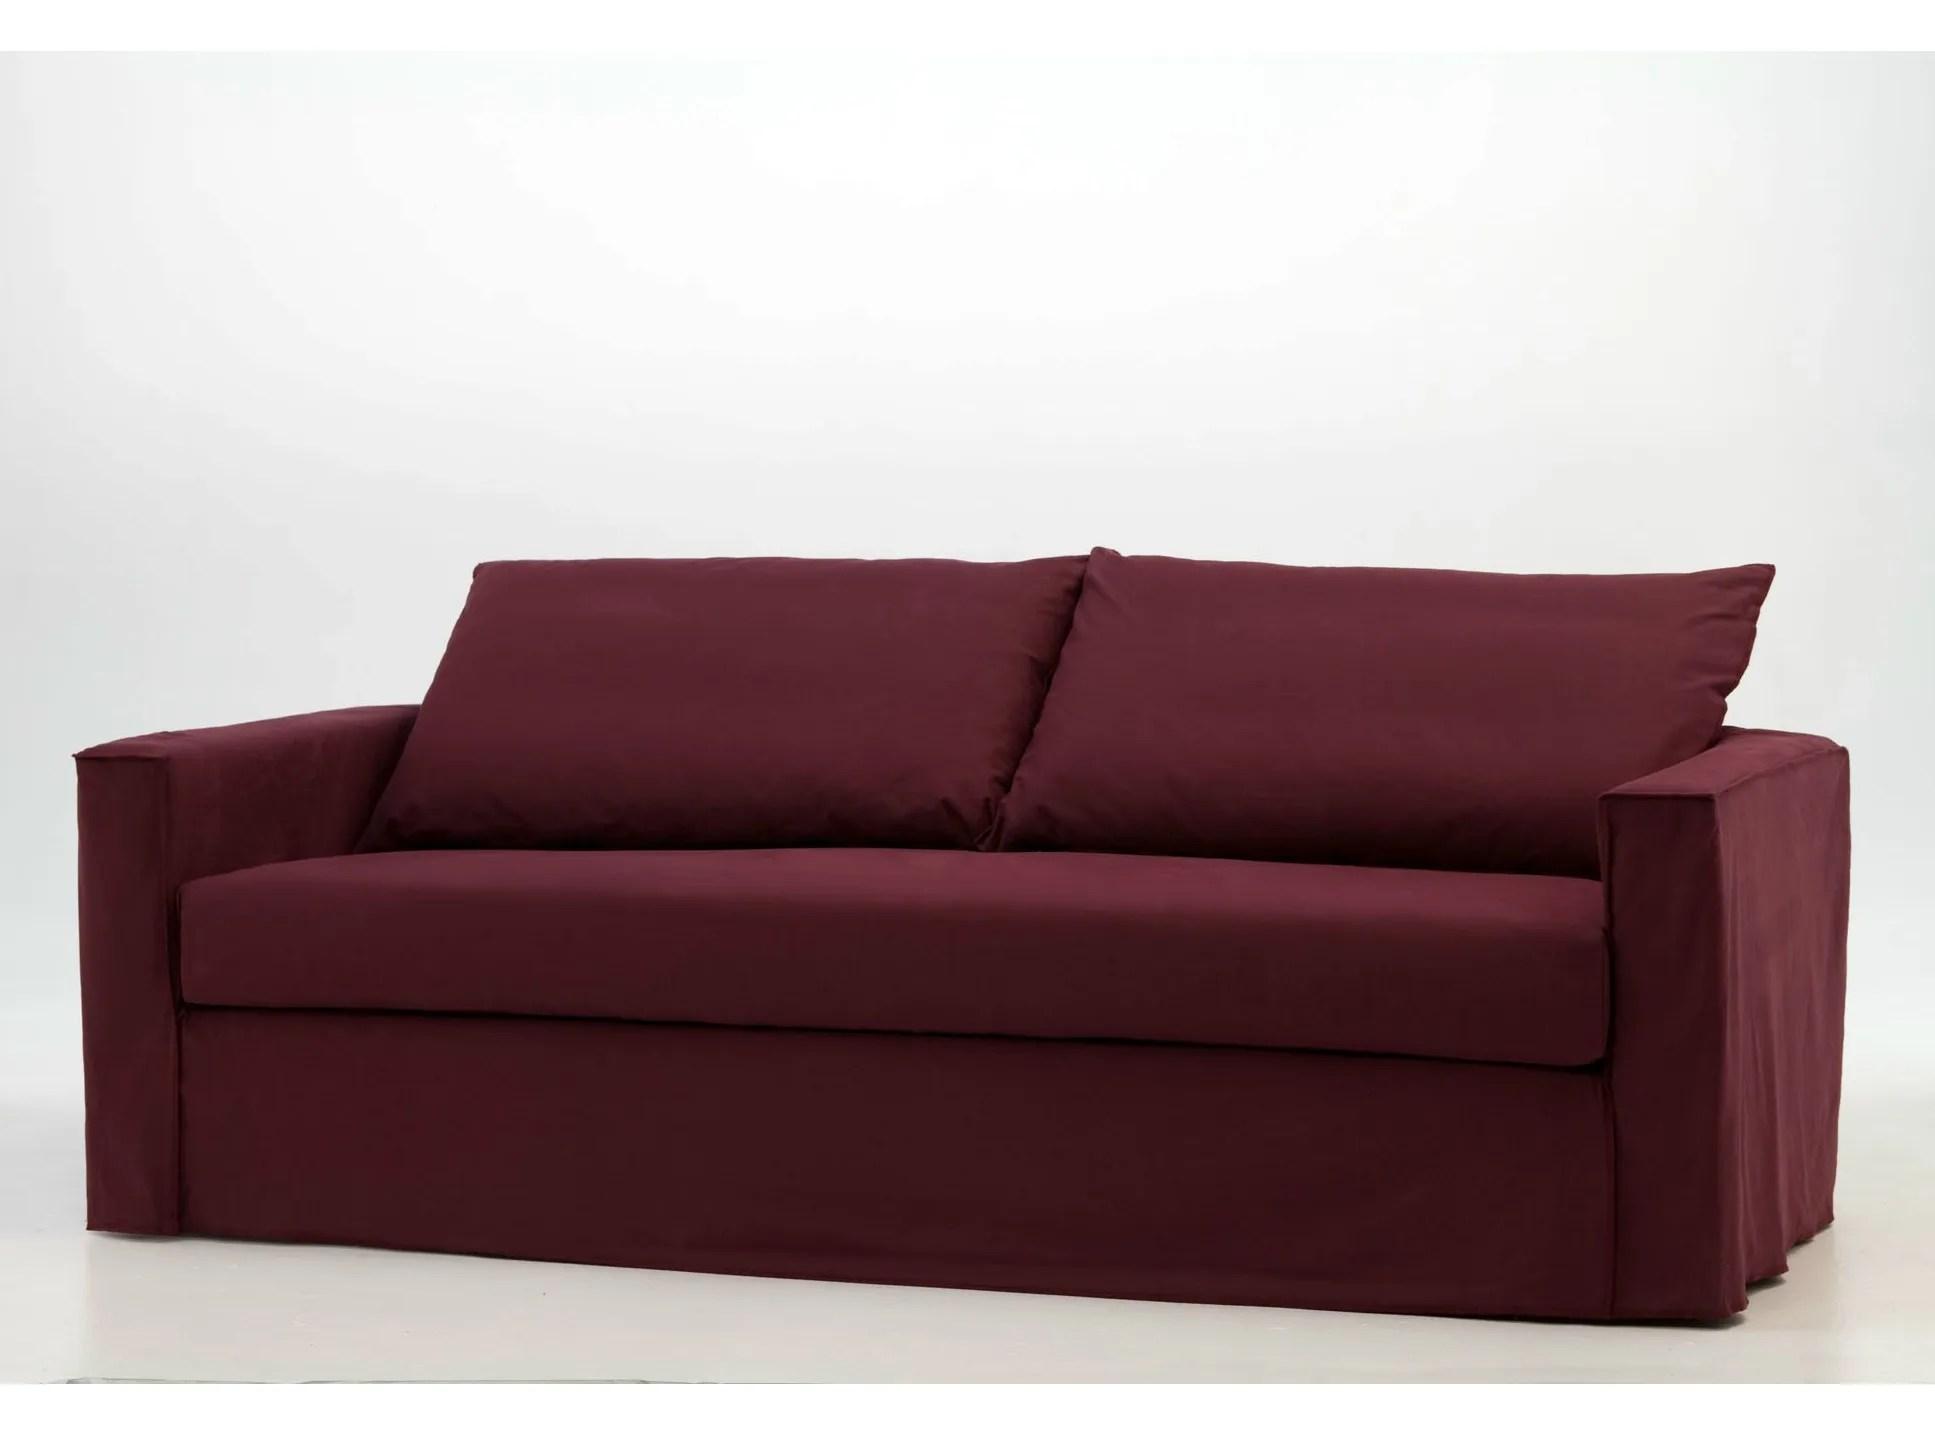 dwr sleeper sofa microfiber chaise havana scavenger with